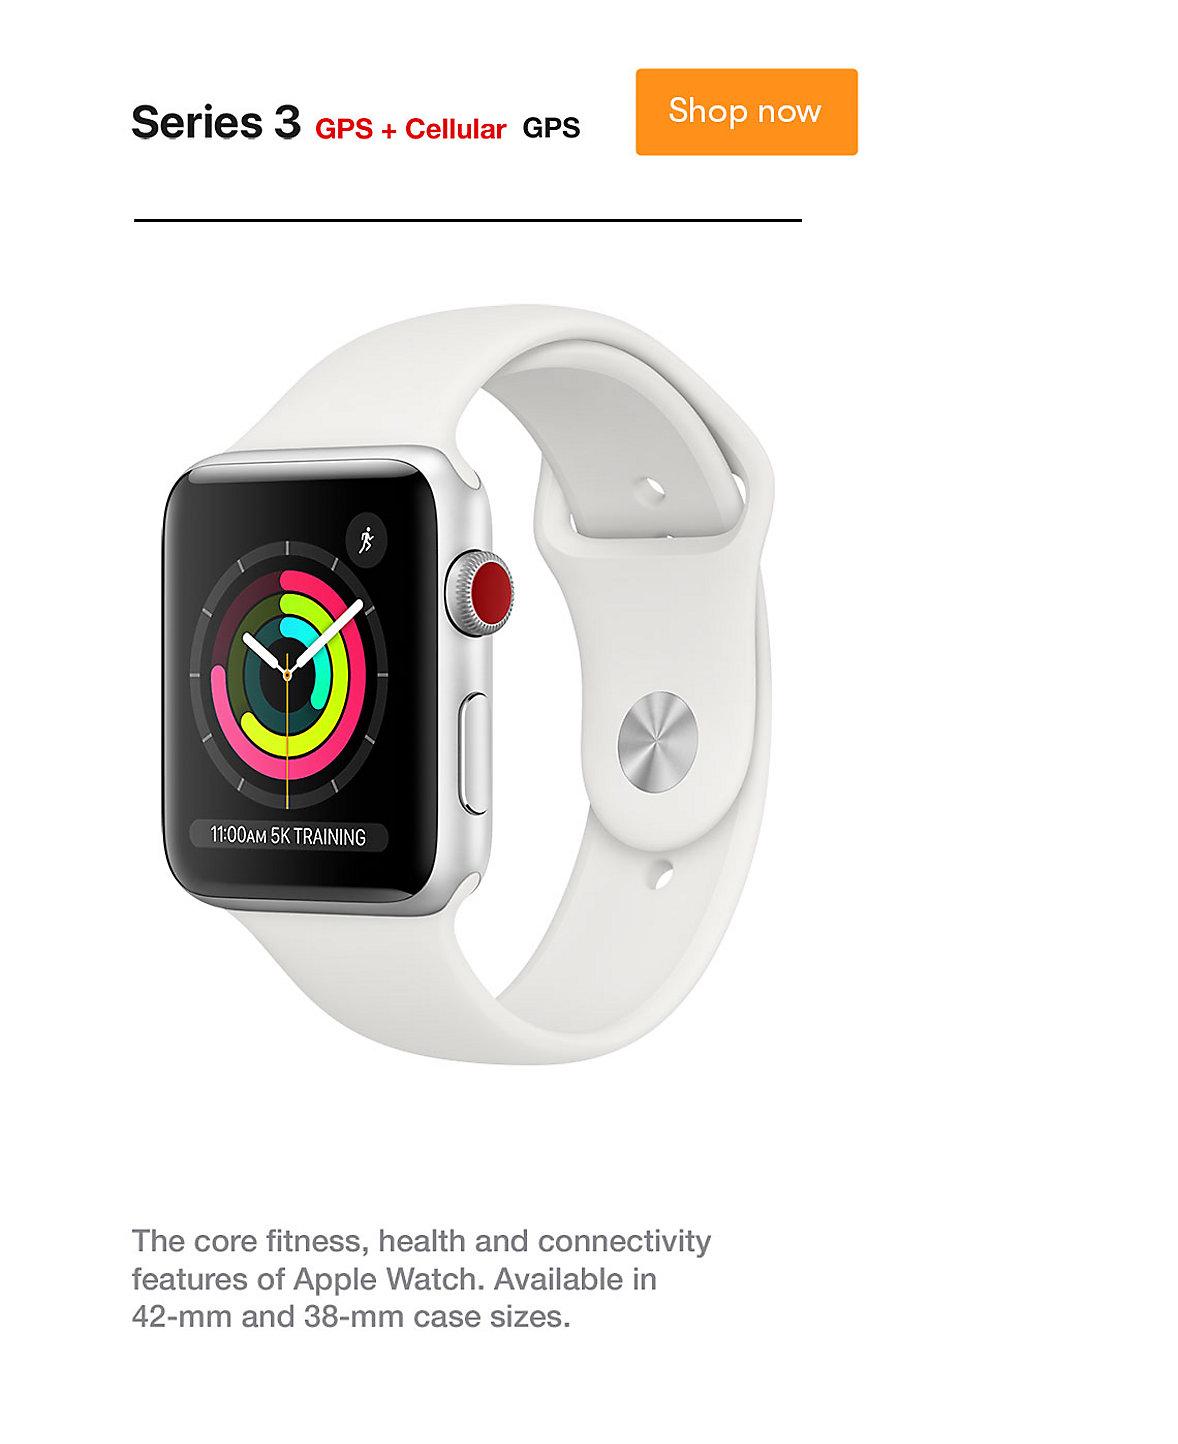 Apple Watch Series 3 GPS Cellular Shop Now